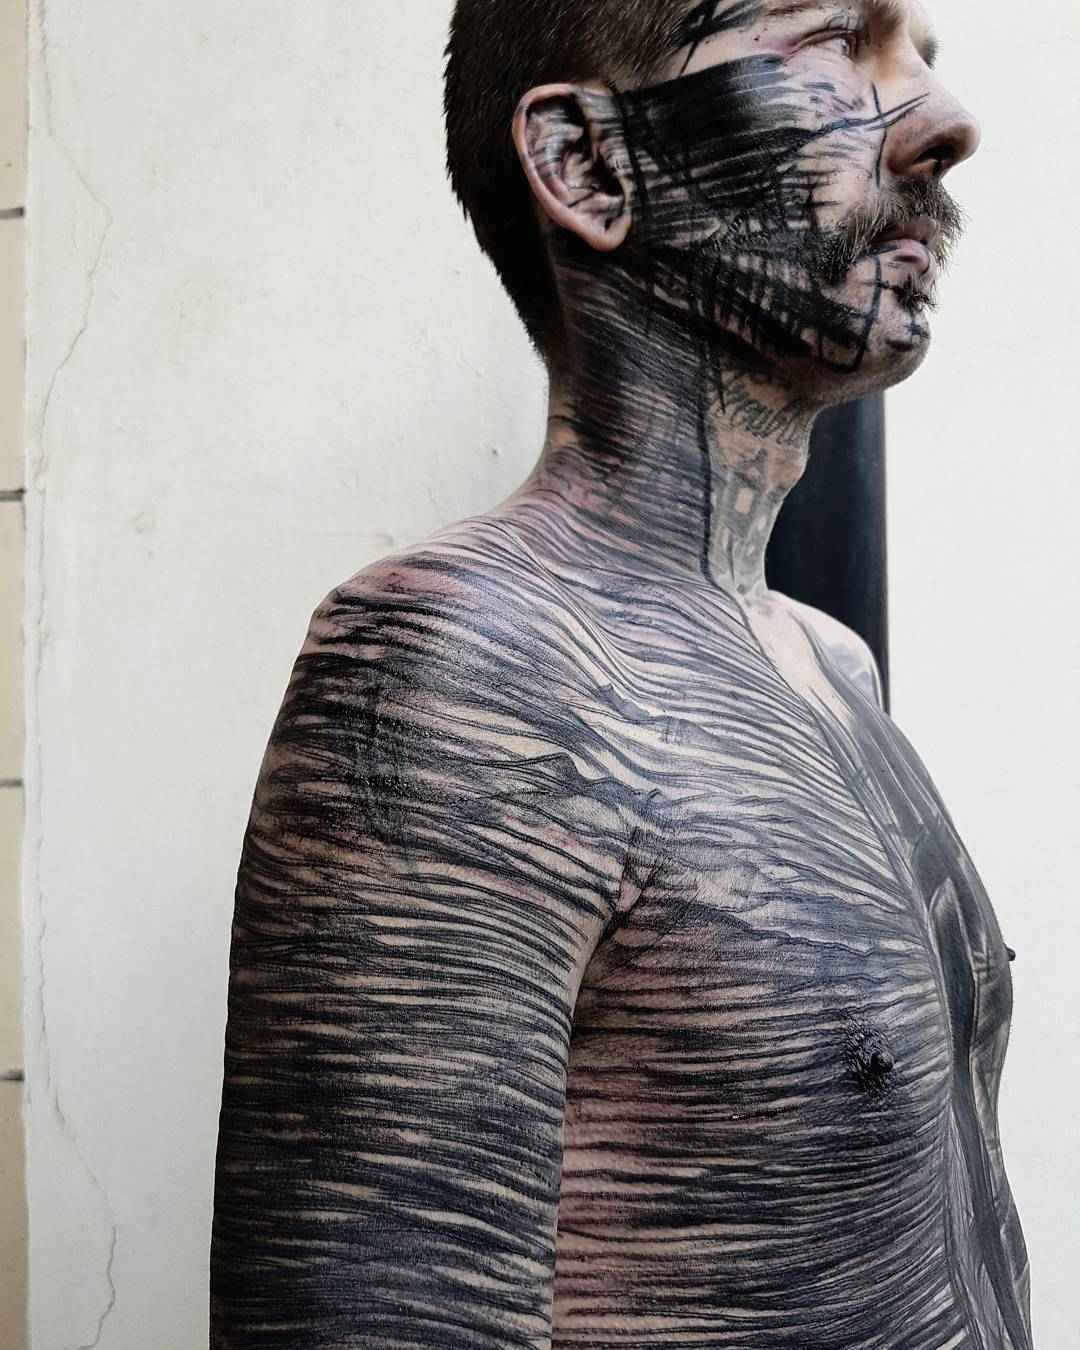 Brutal blackwork valerio cancellier inkppl tattoo for Blackwork tattoo artists